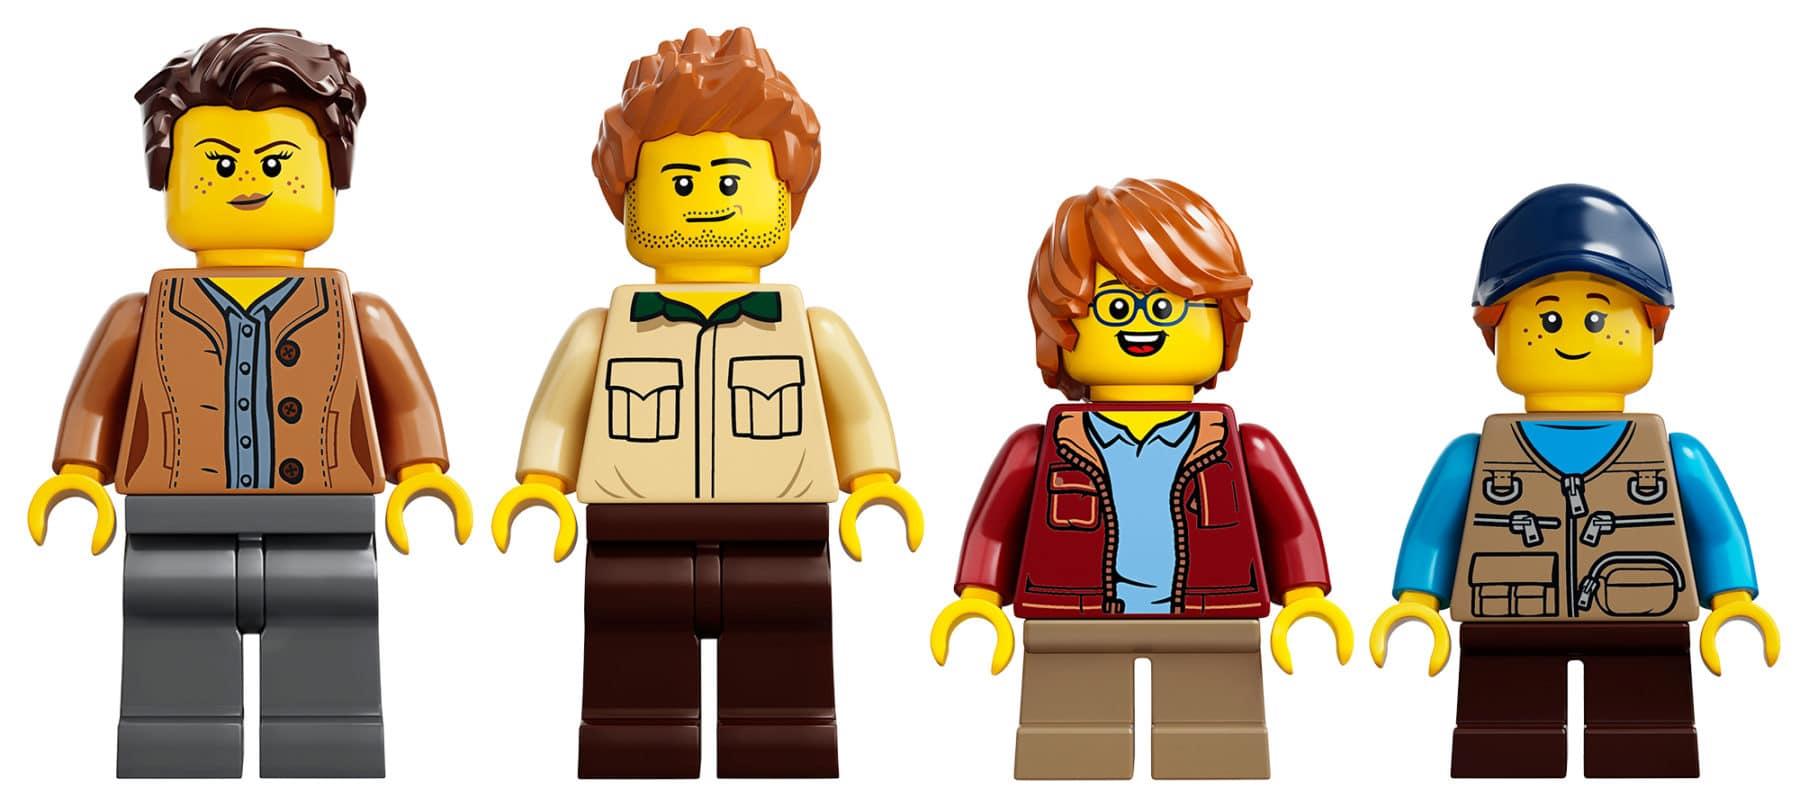 LEGO 21318 Baumhaus Minifiguren